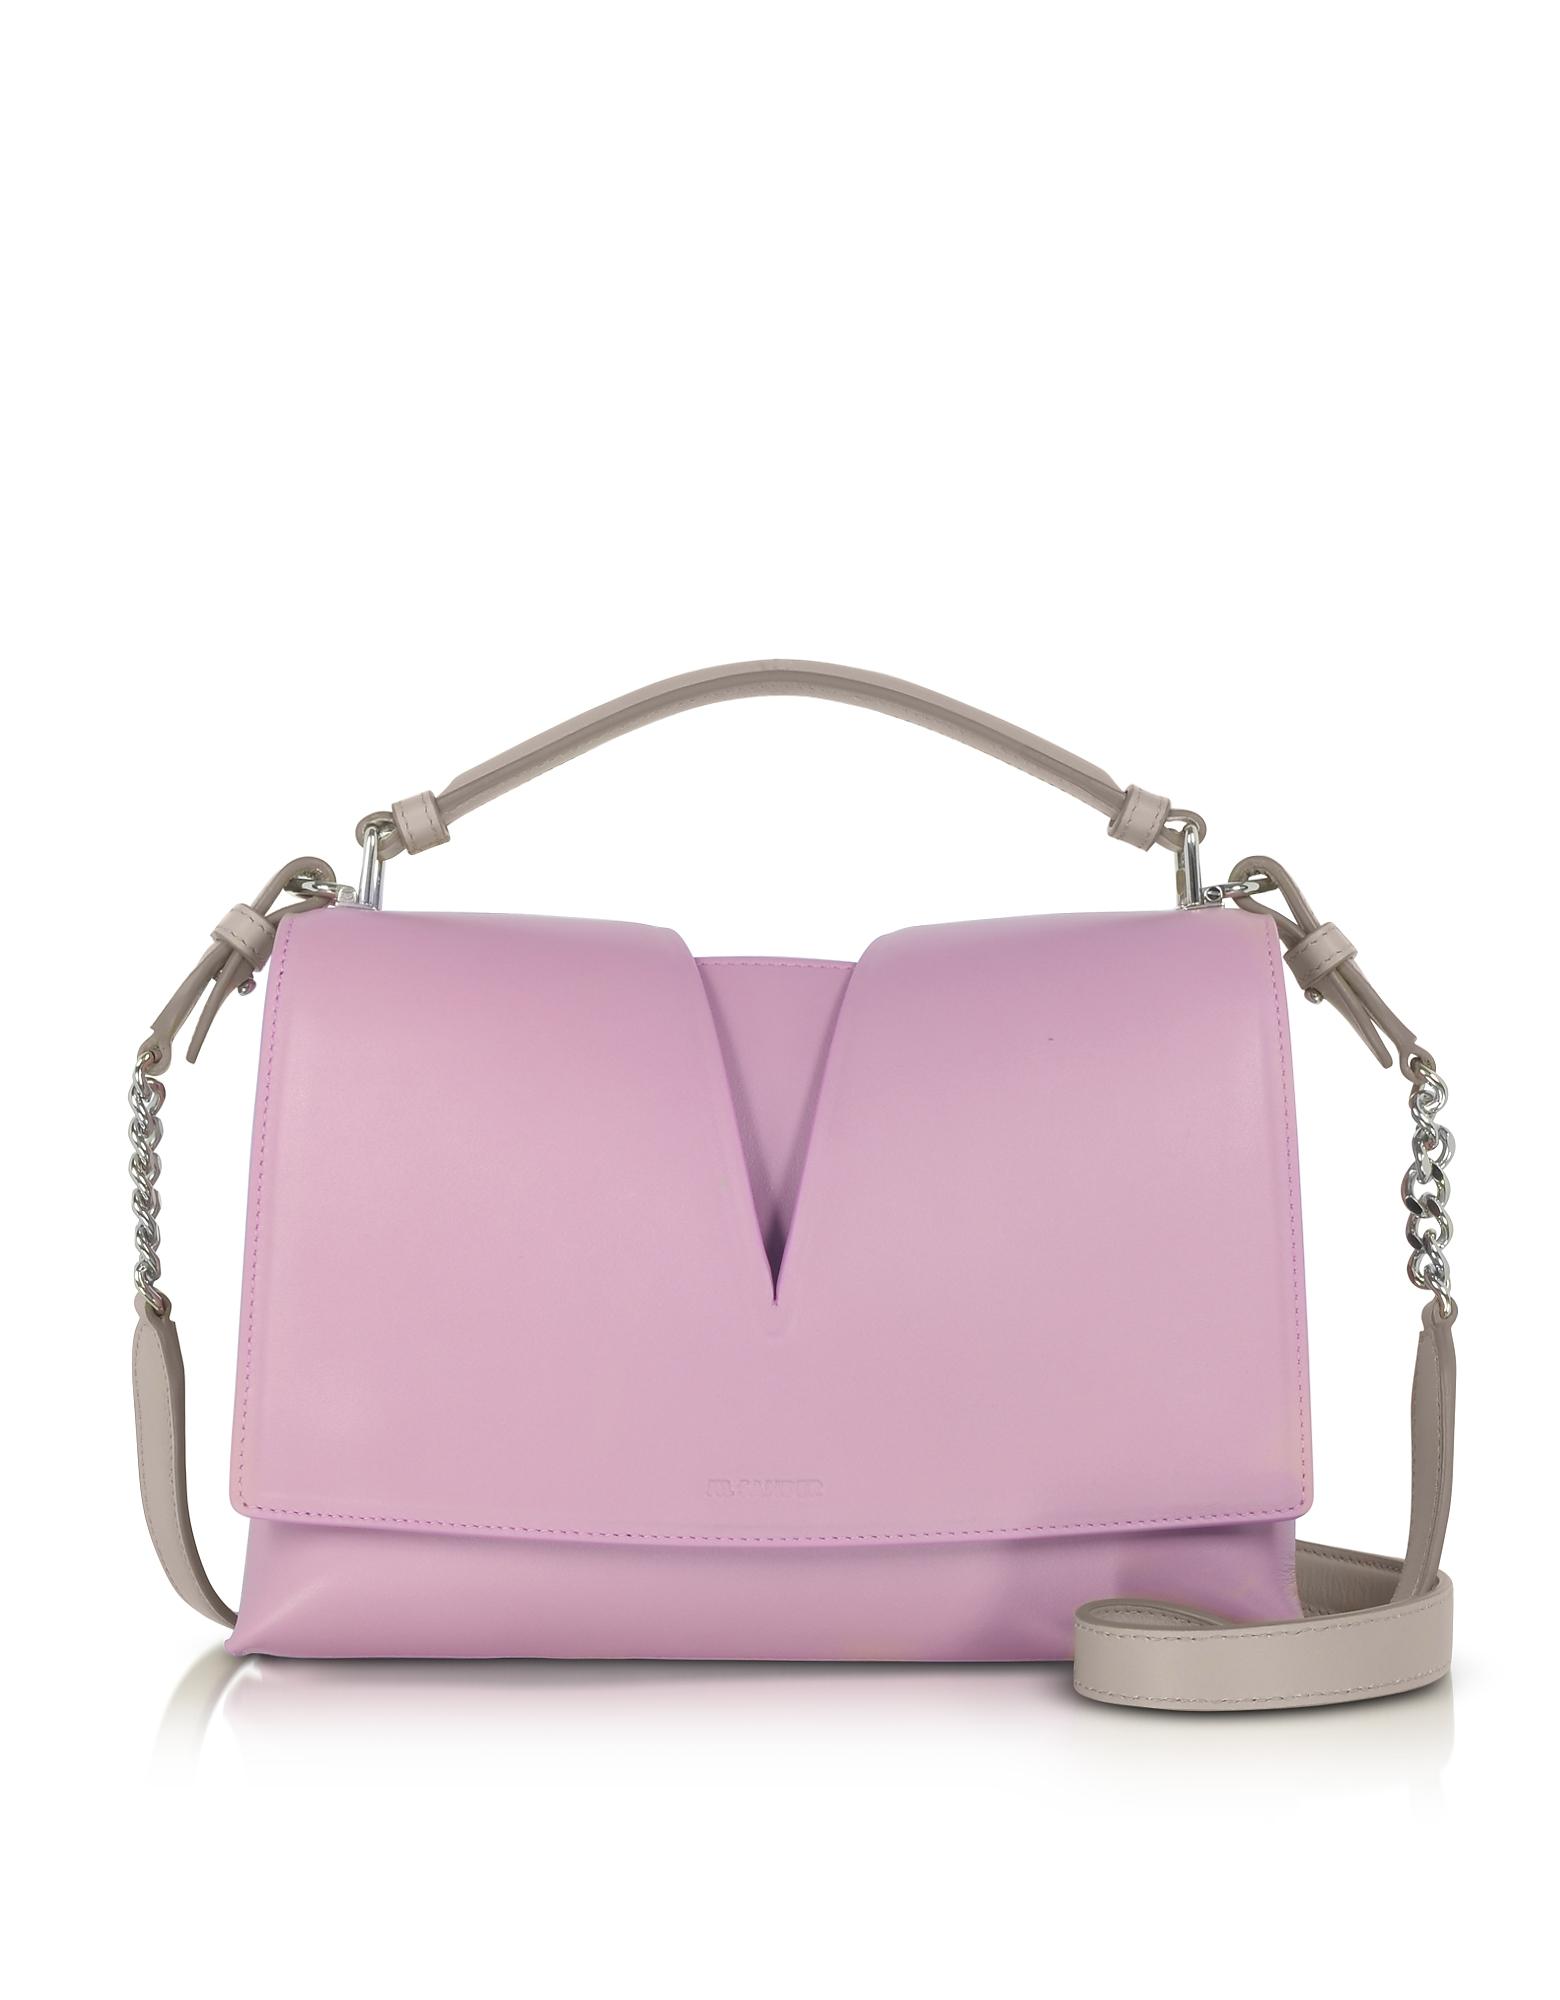 Jil Sander Handbags, View Handle Small Knitted Leather Shoulder Bag